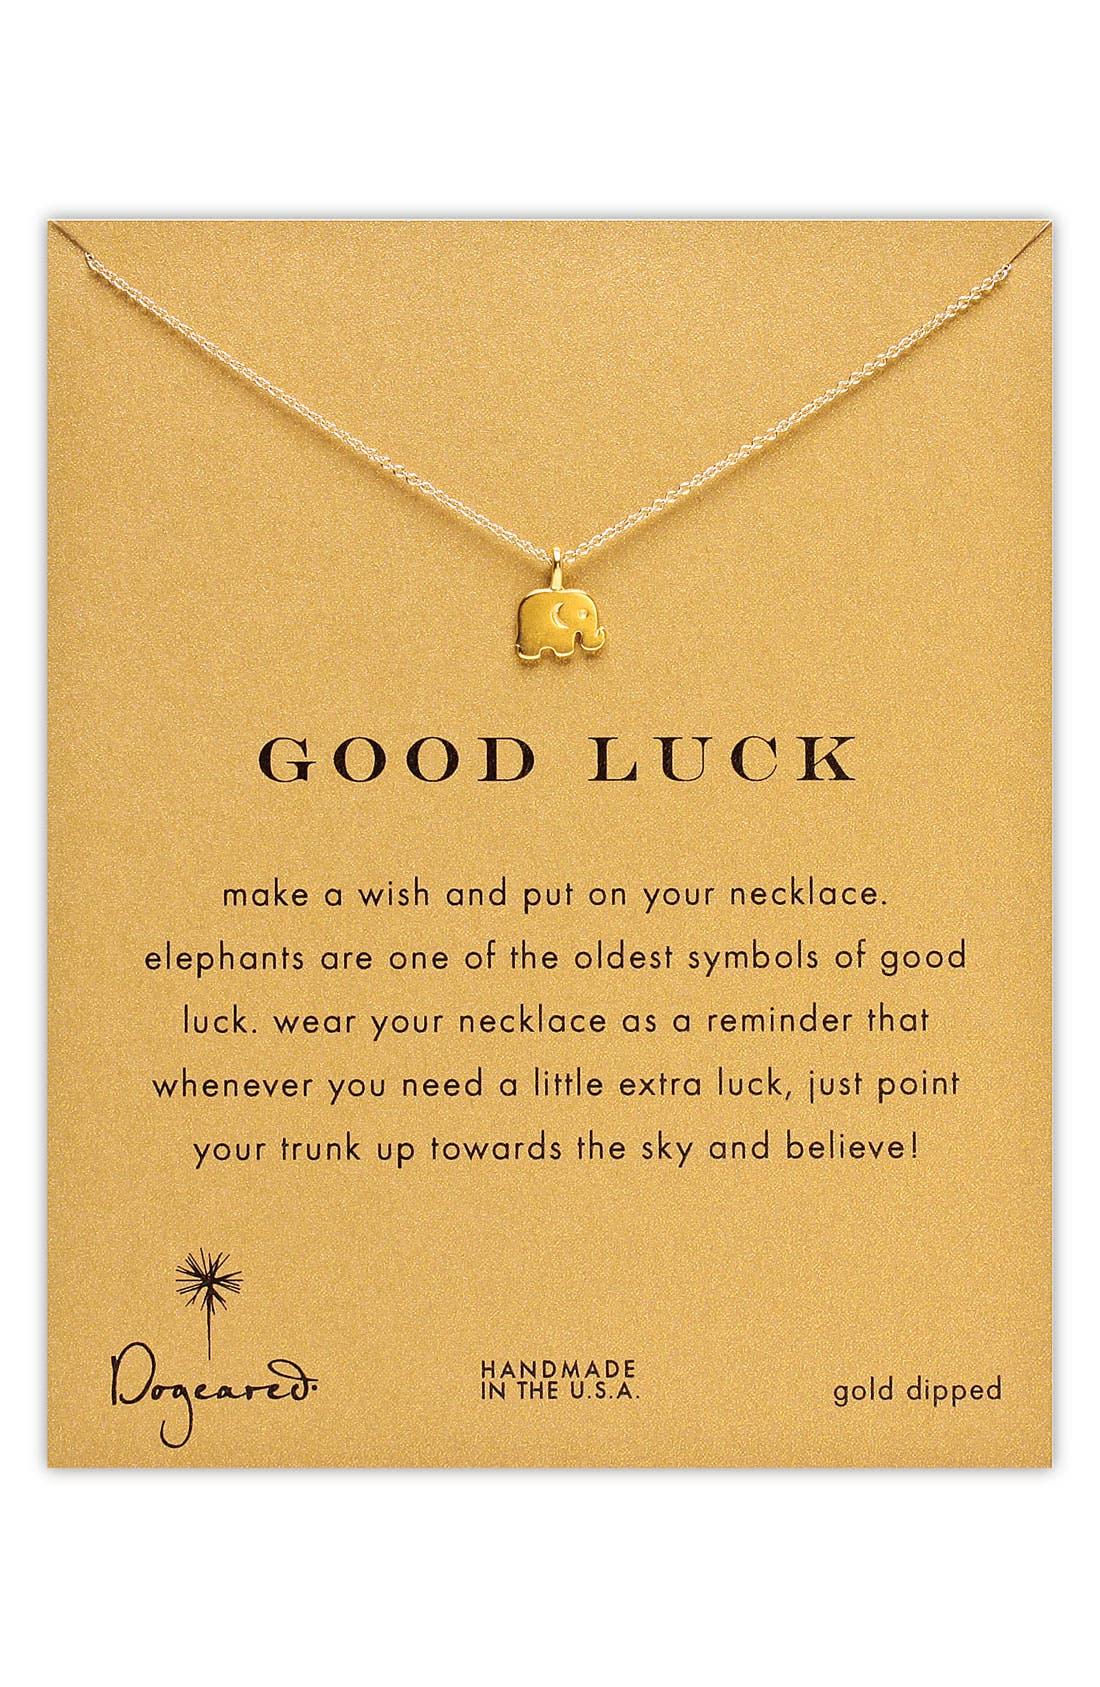 Alternate Image 1 Selected - Dogeared 'Reminder - Good Luck' Elephant Necklace